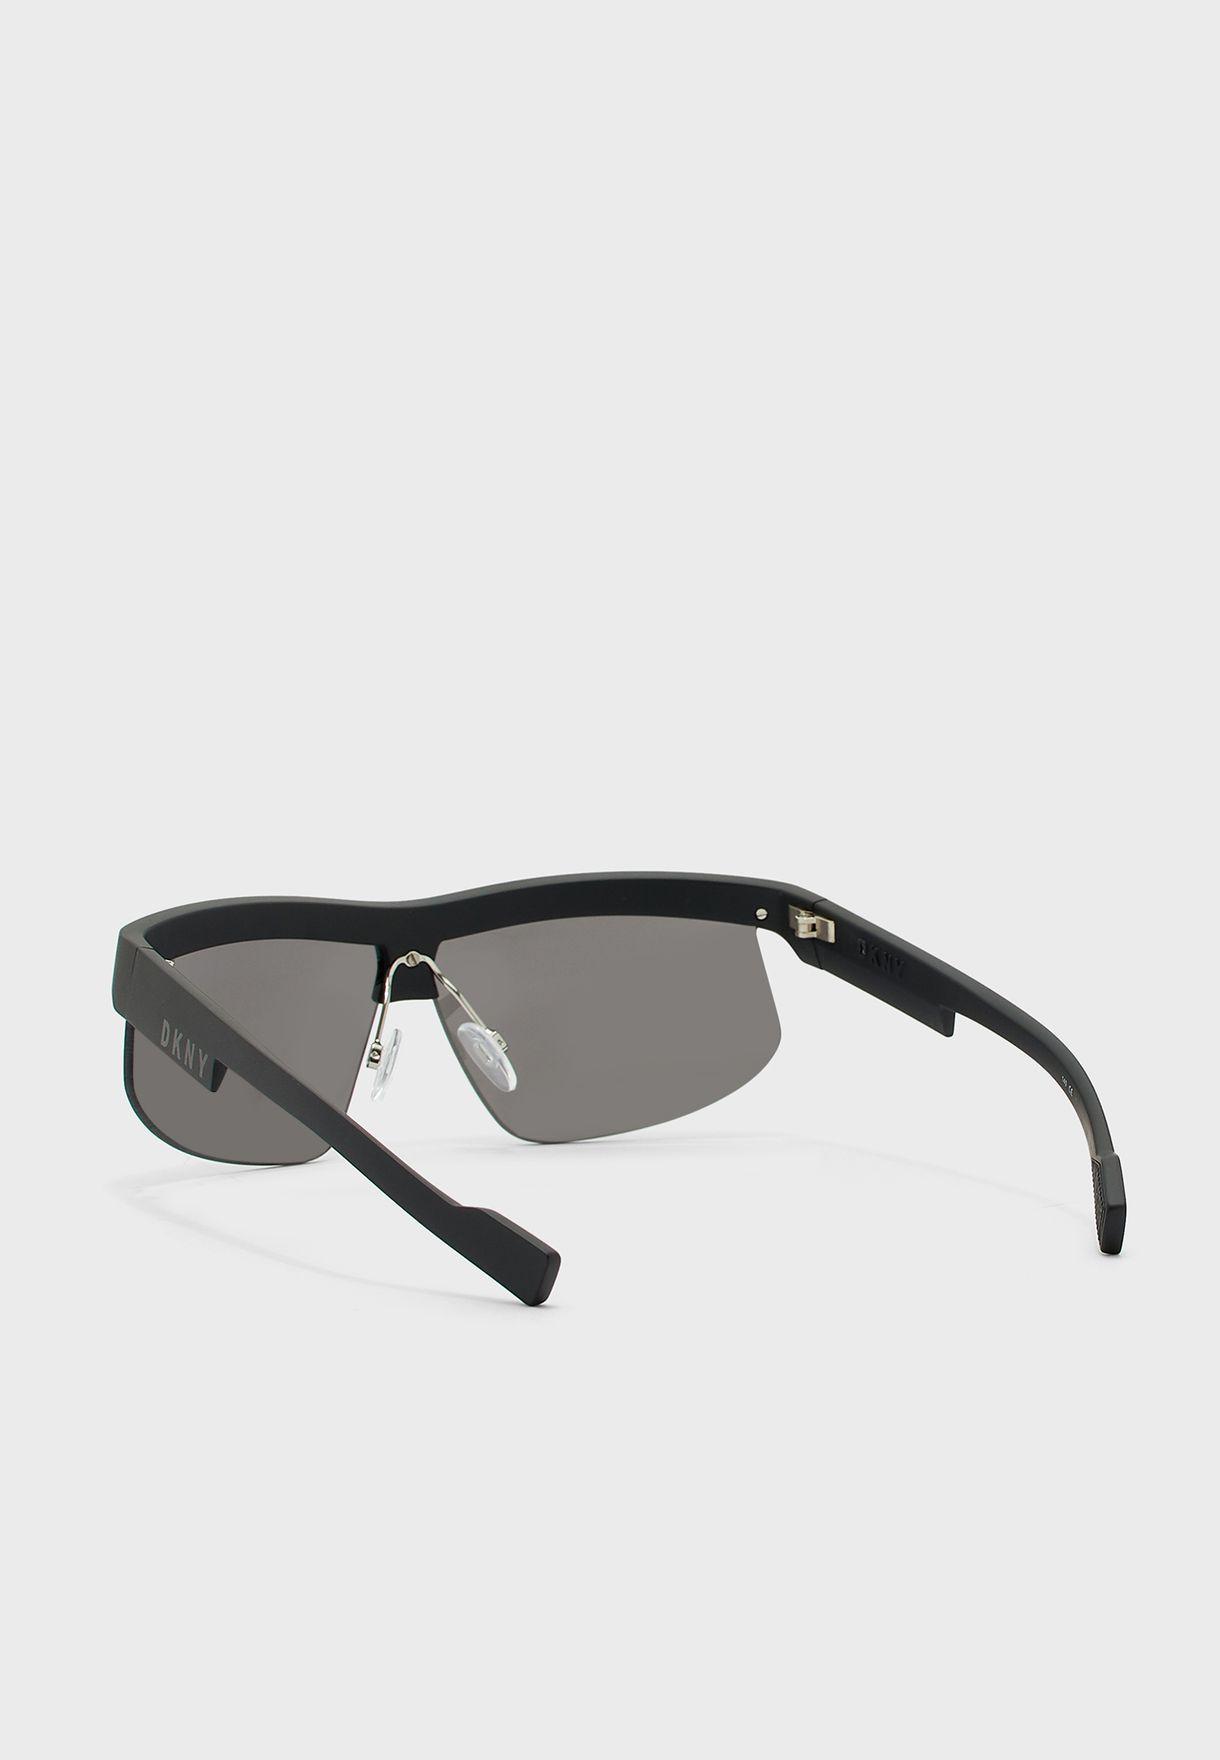 DK515S Shield Sunglasses